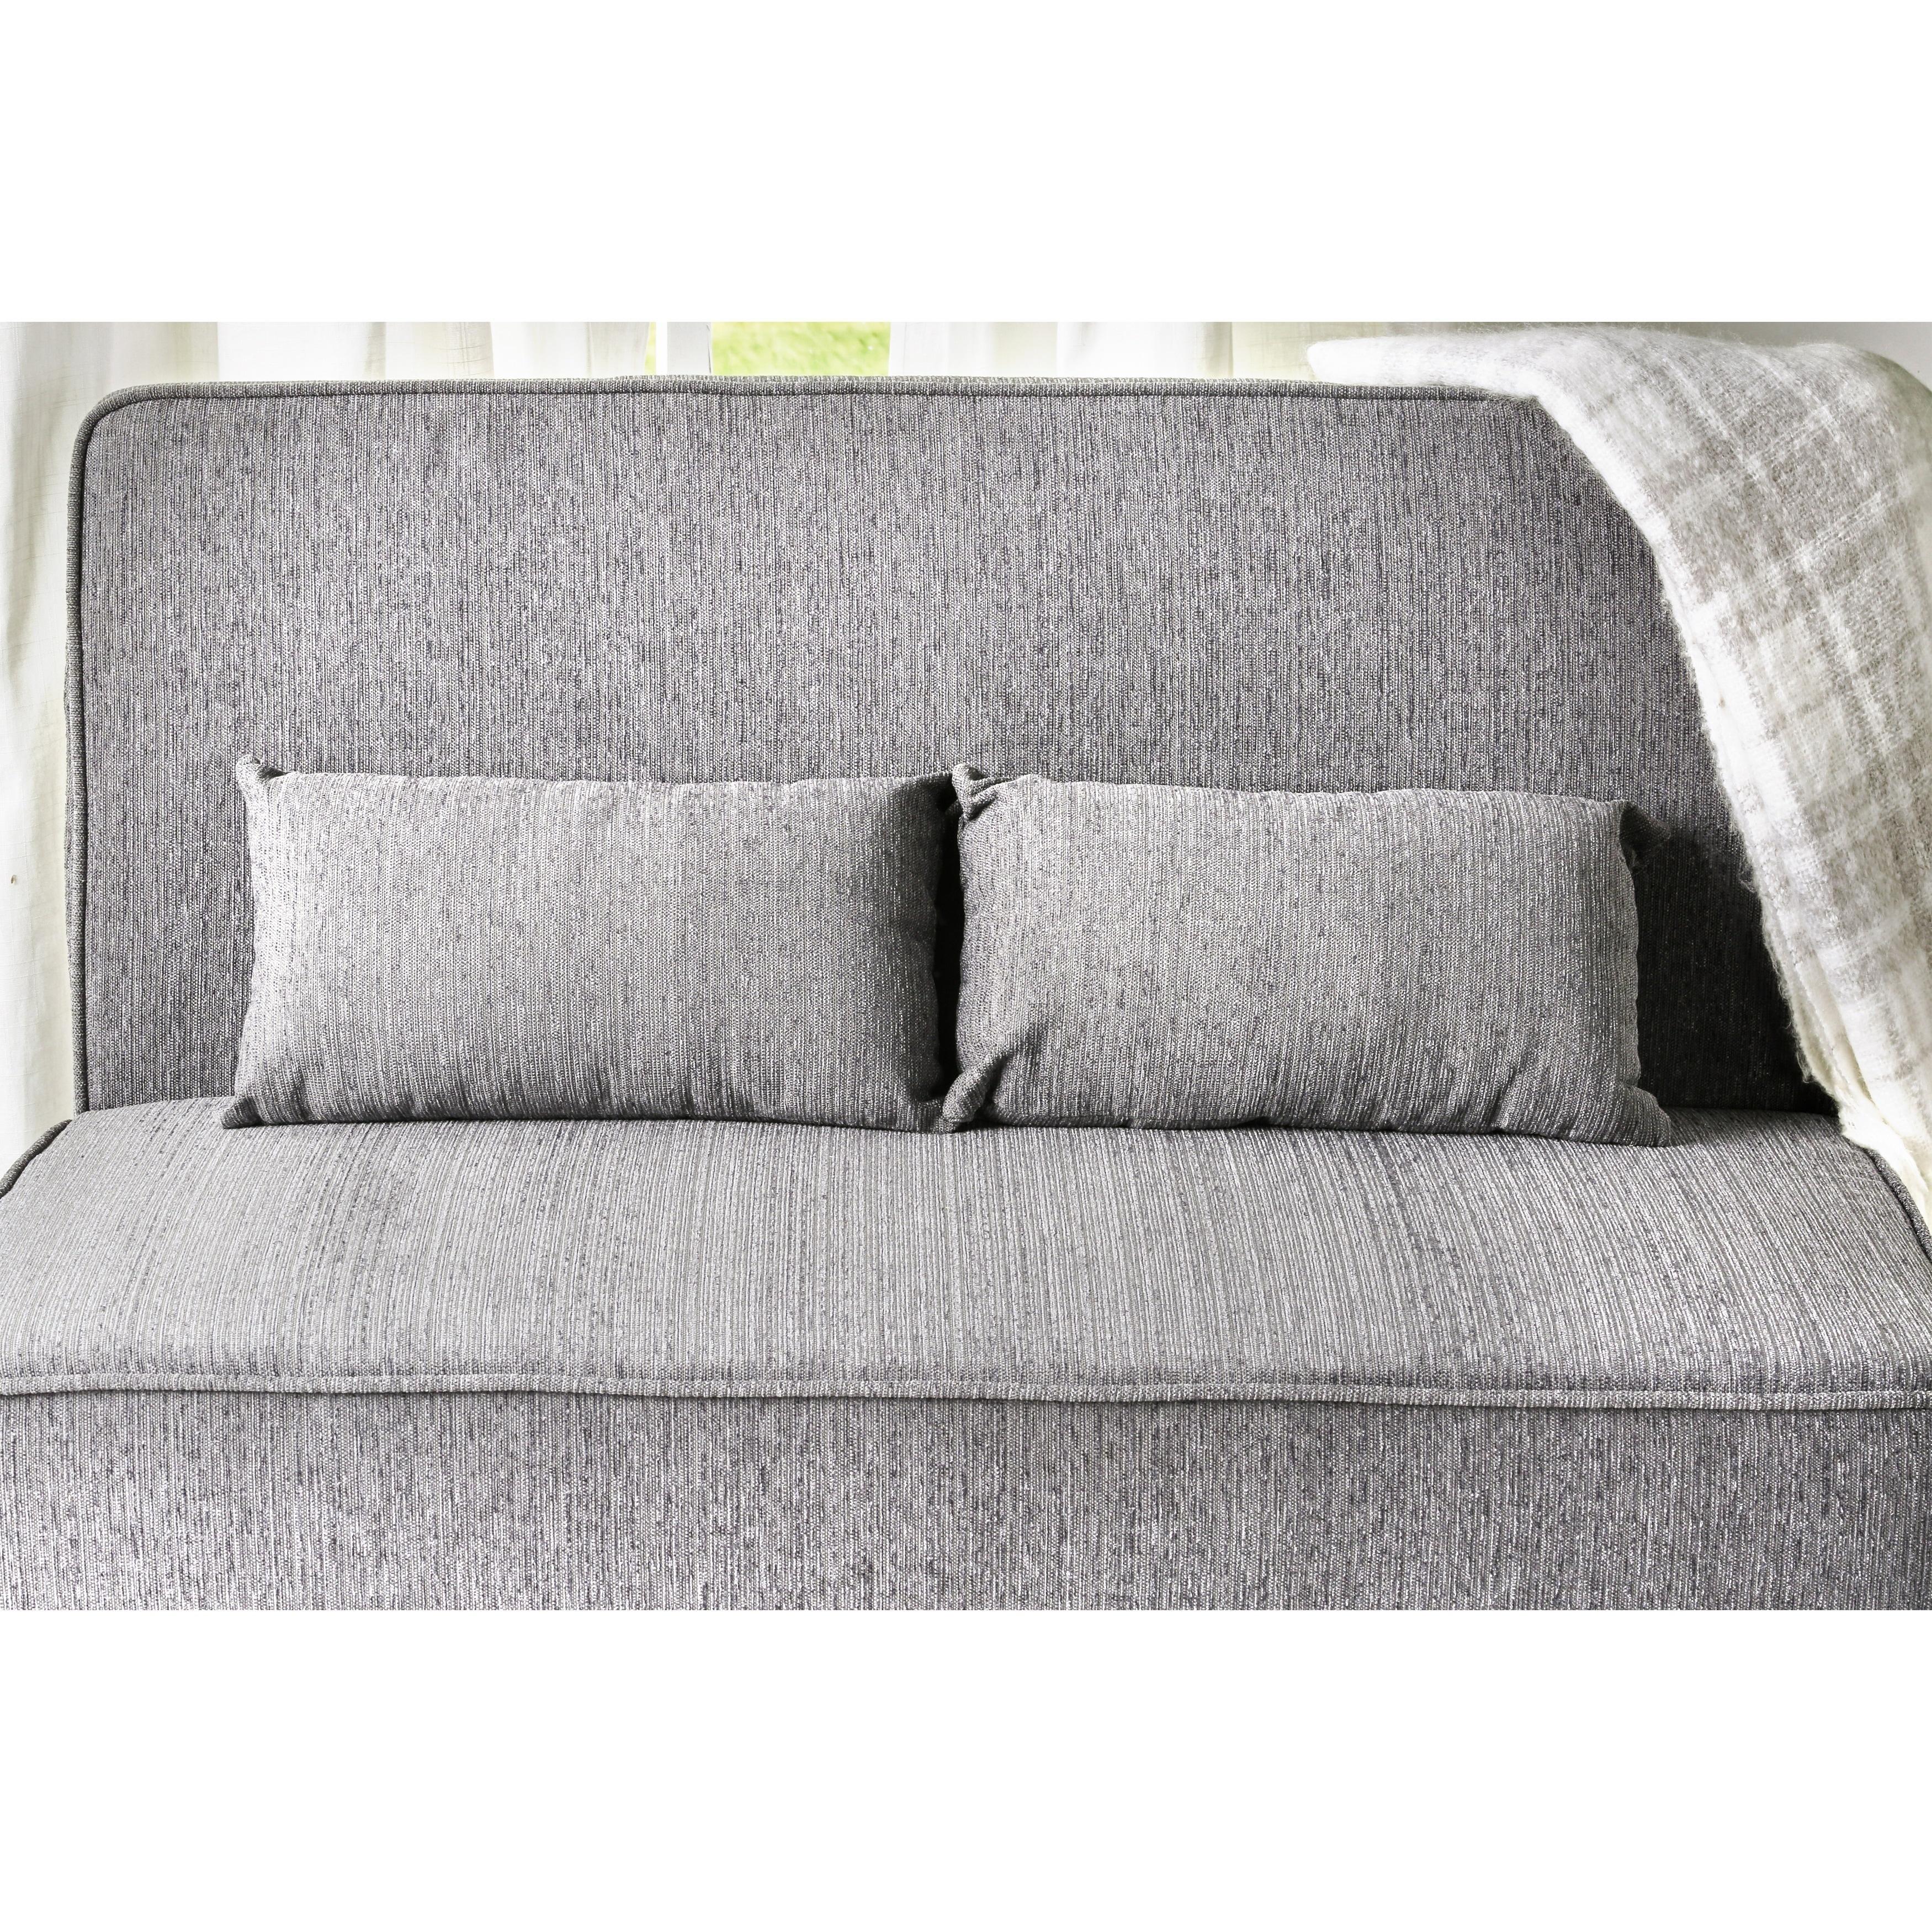 Shop Furniture of America Amirsa Modern Upholstered Armless Loveseat ...